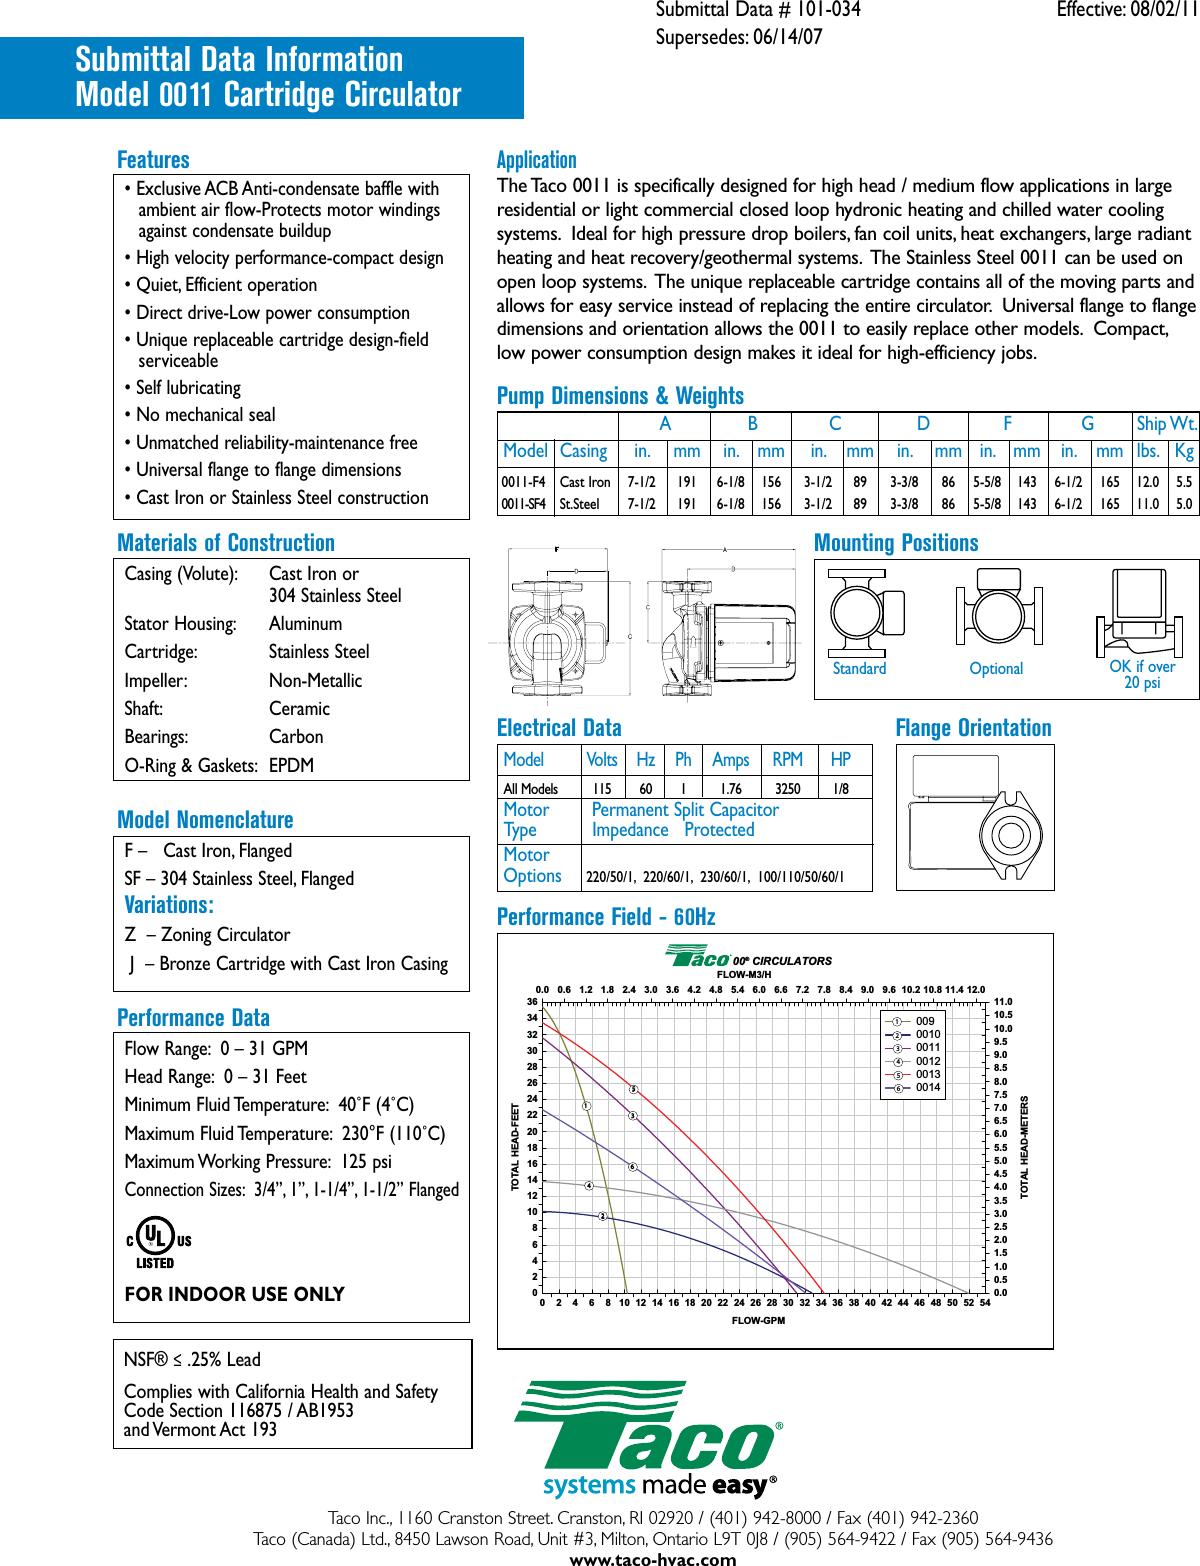 taco cartridge circulator 007 f5 wiring diagram taco 0011